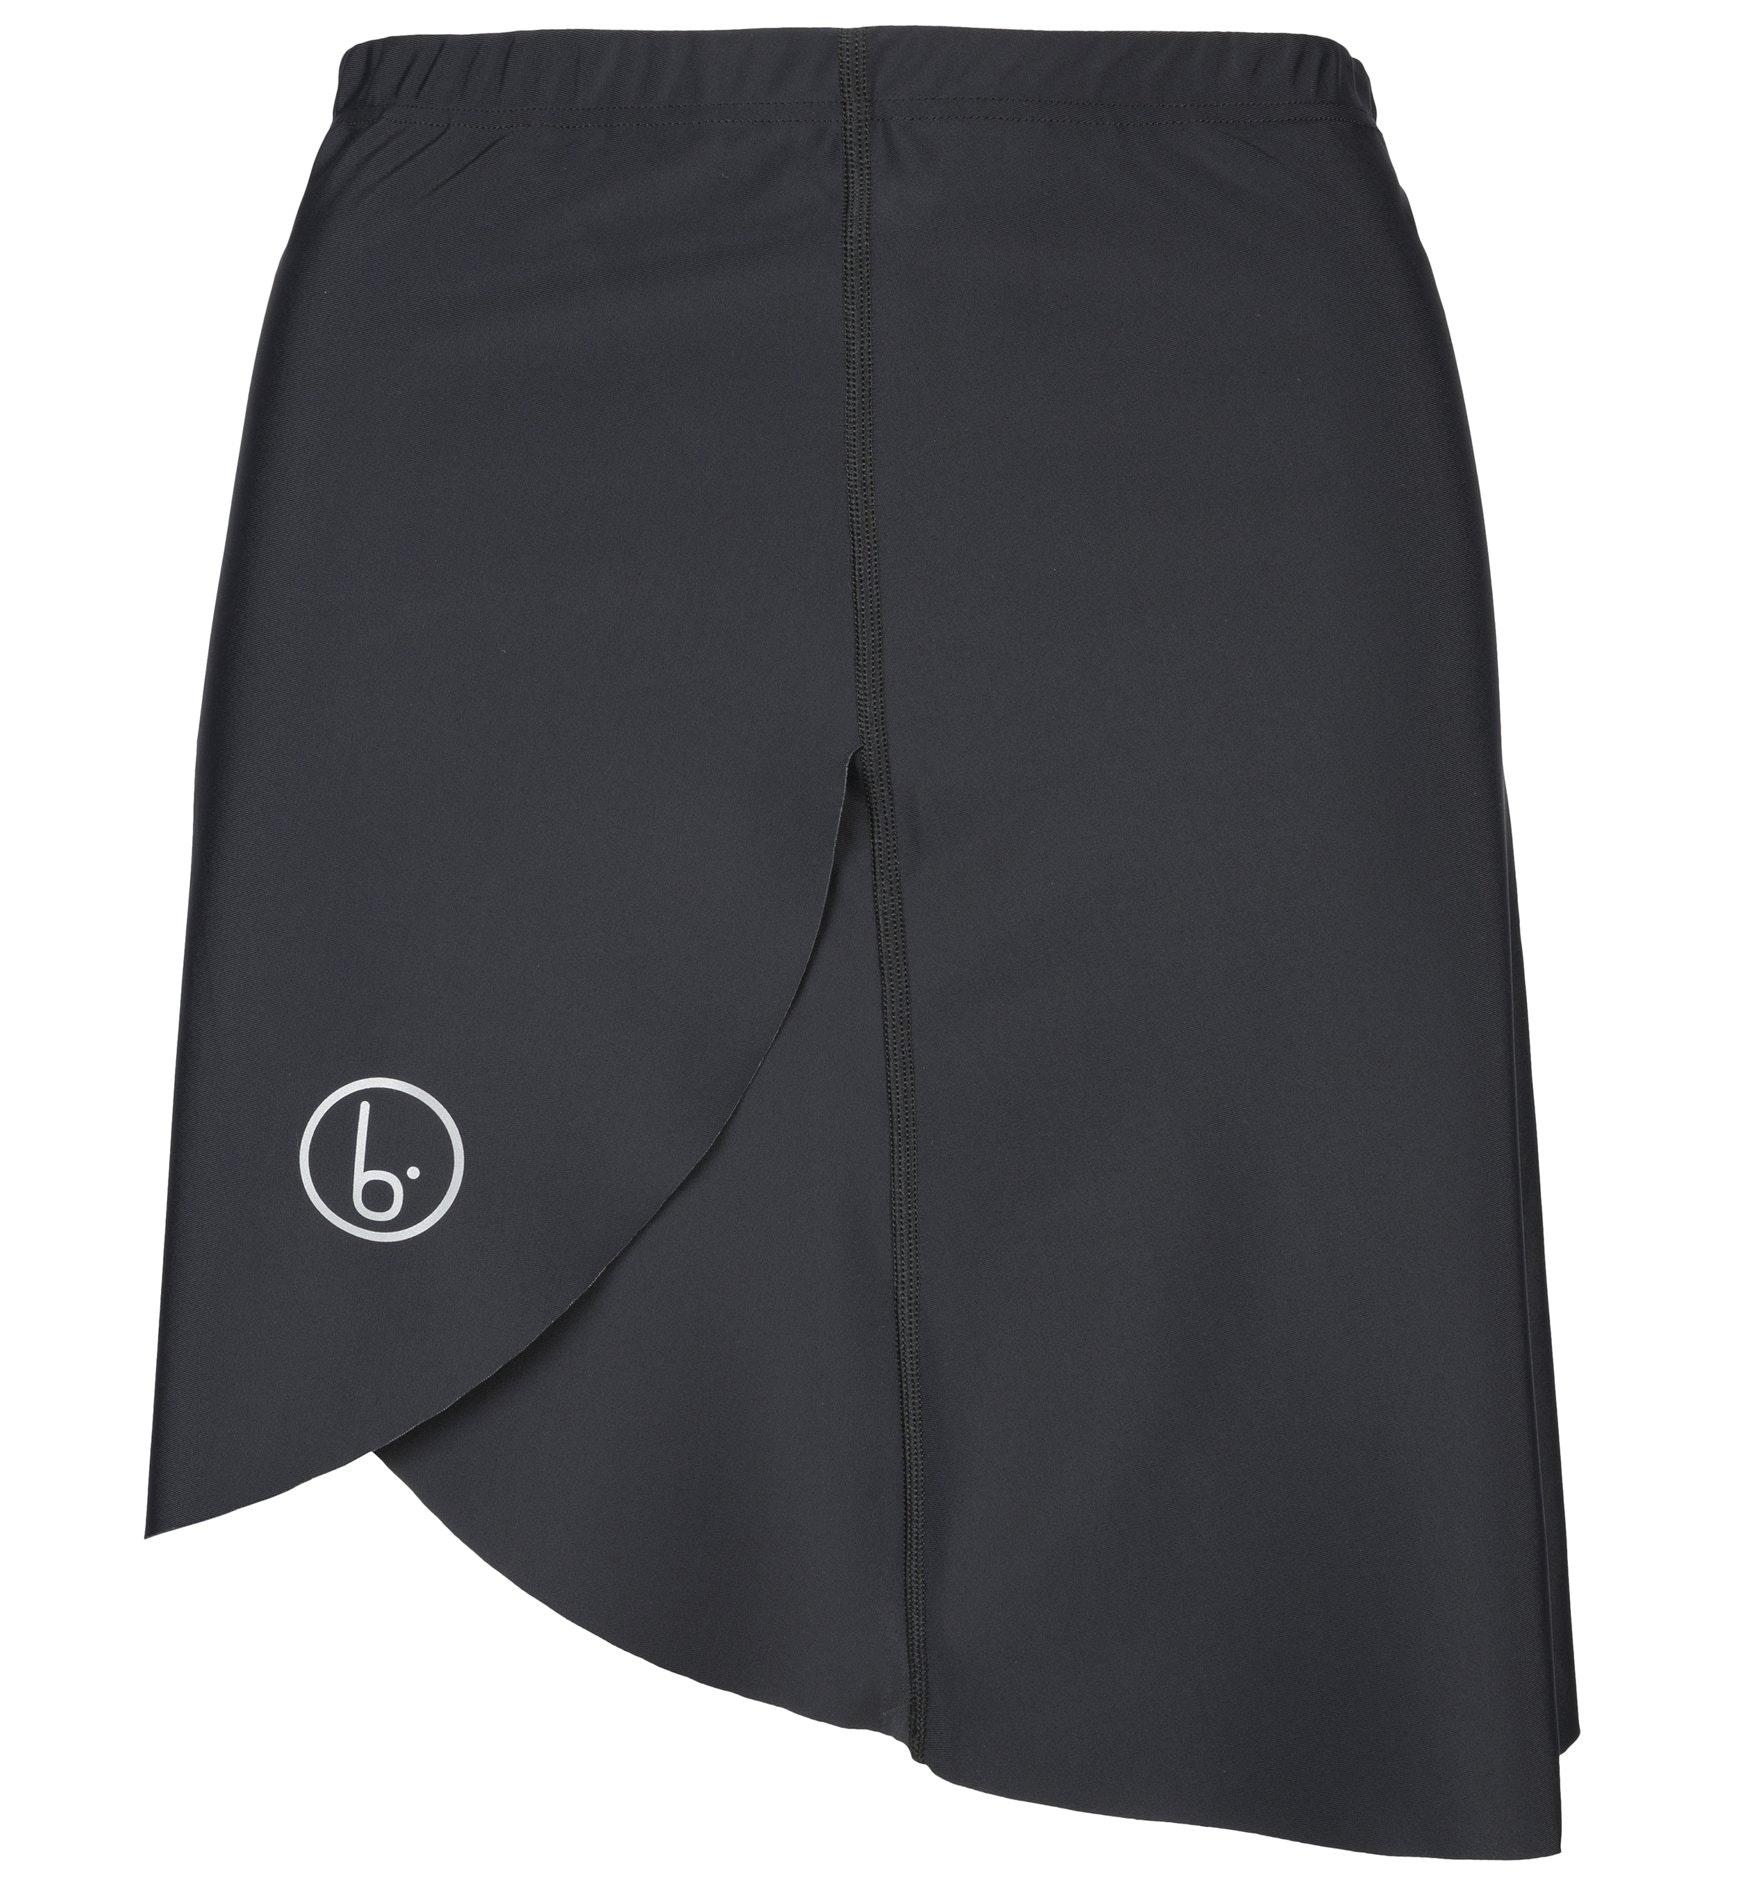 Biciclista The Black Skirt 2.0 - Radrock - Damen